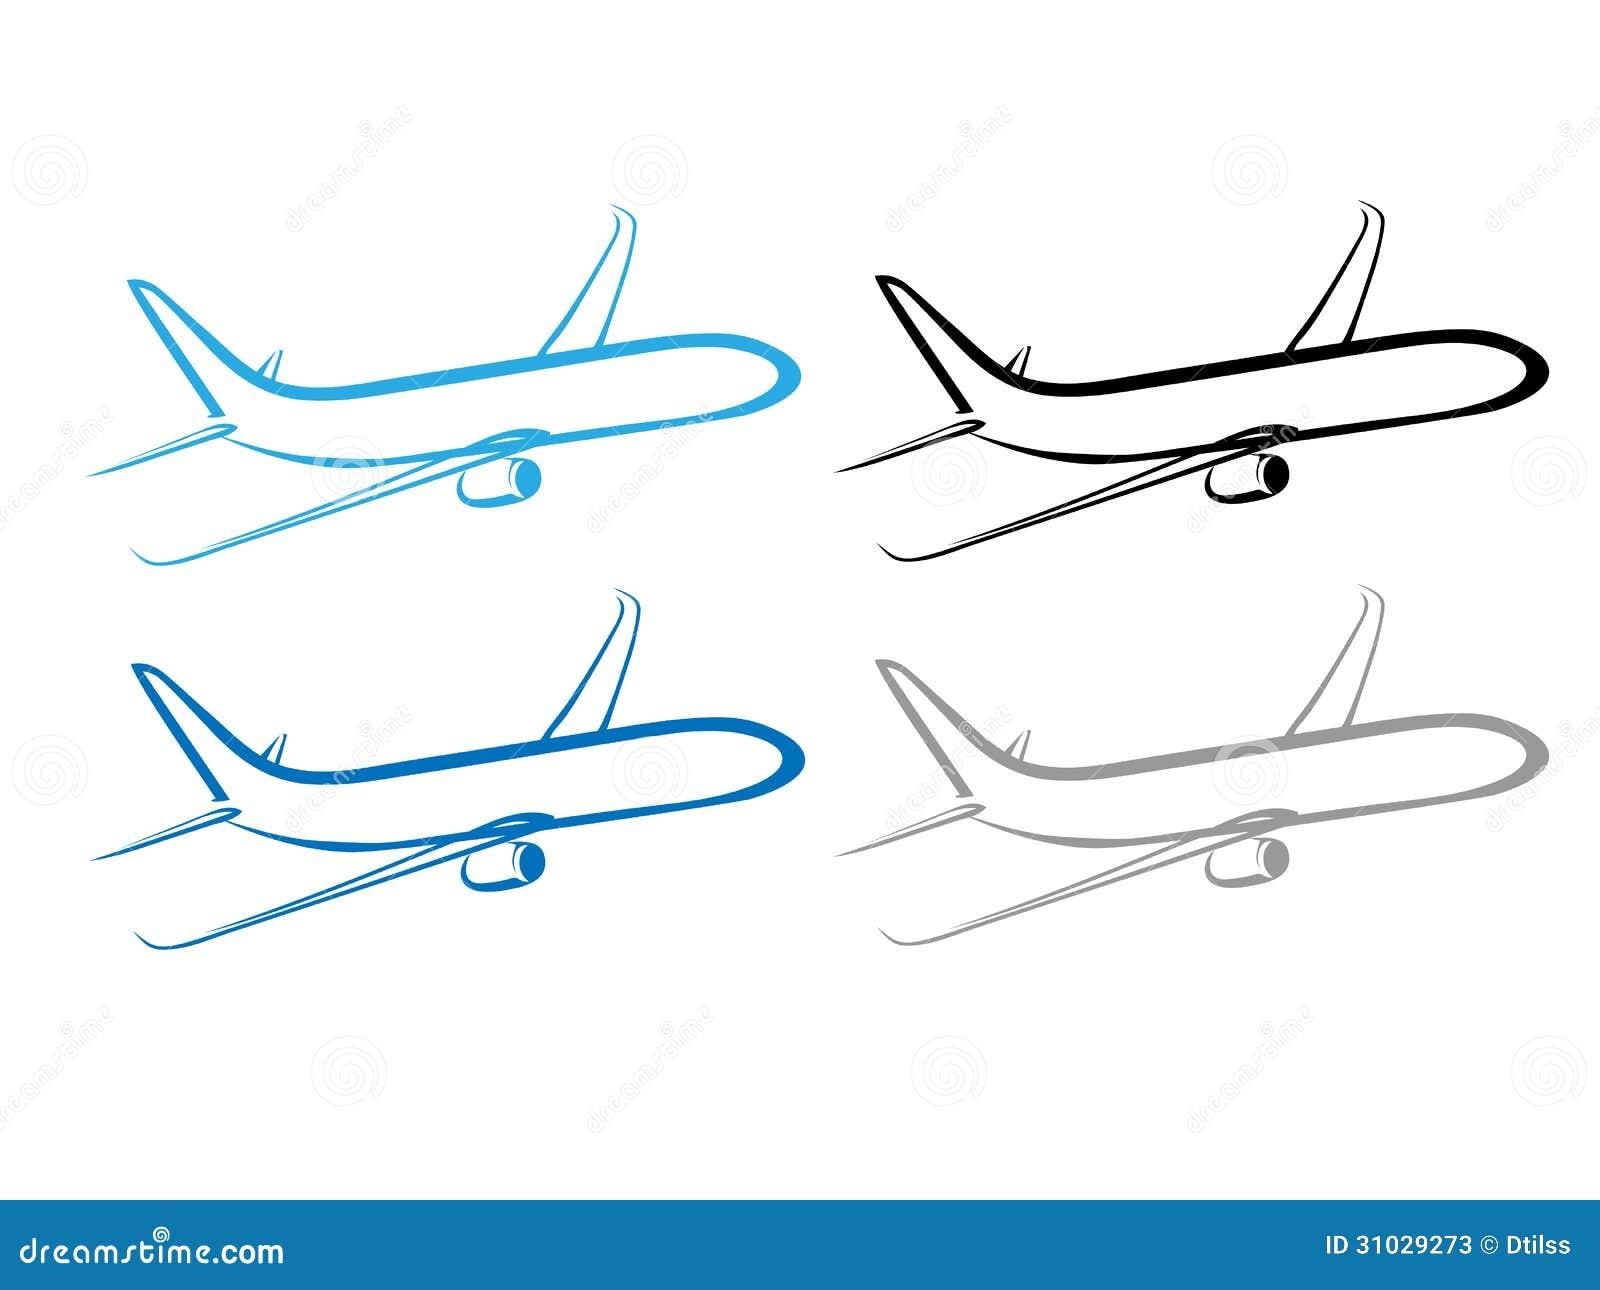 Airplane plane airplane symbol stylized airplane stock vector airplane plane airplane symbol stylized airplane buycottarizona Gallery